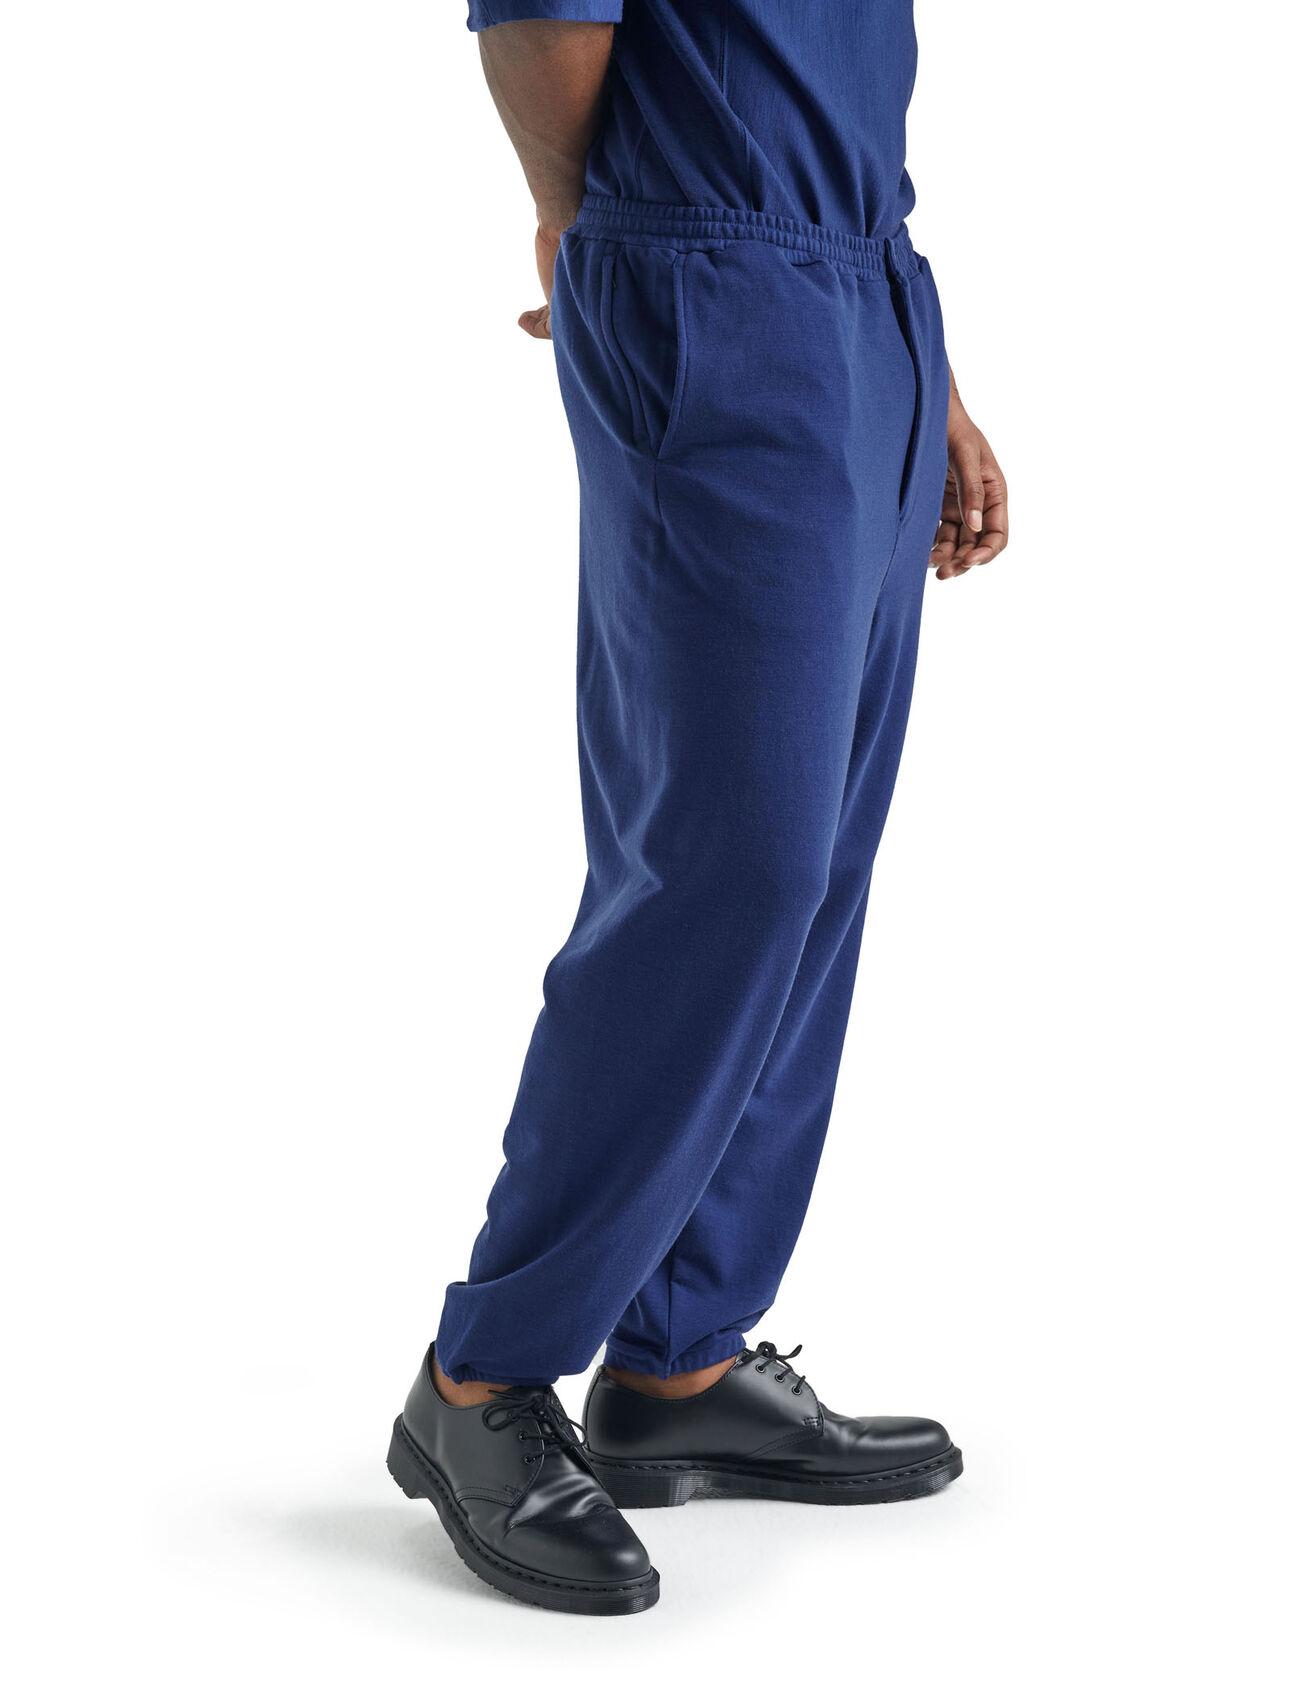 Merino 200 Terry Jogger Pants